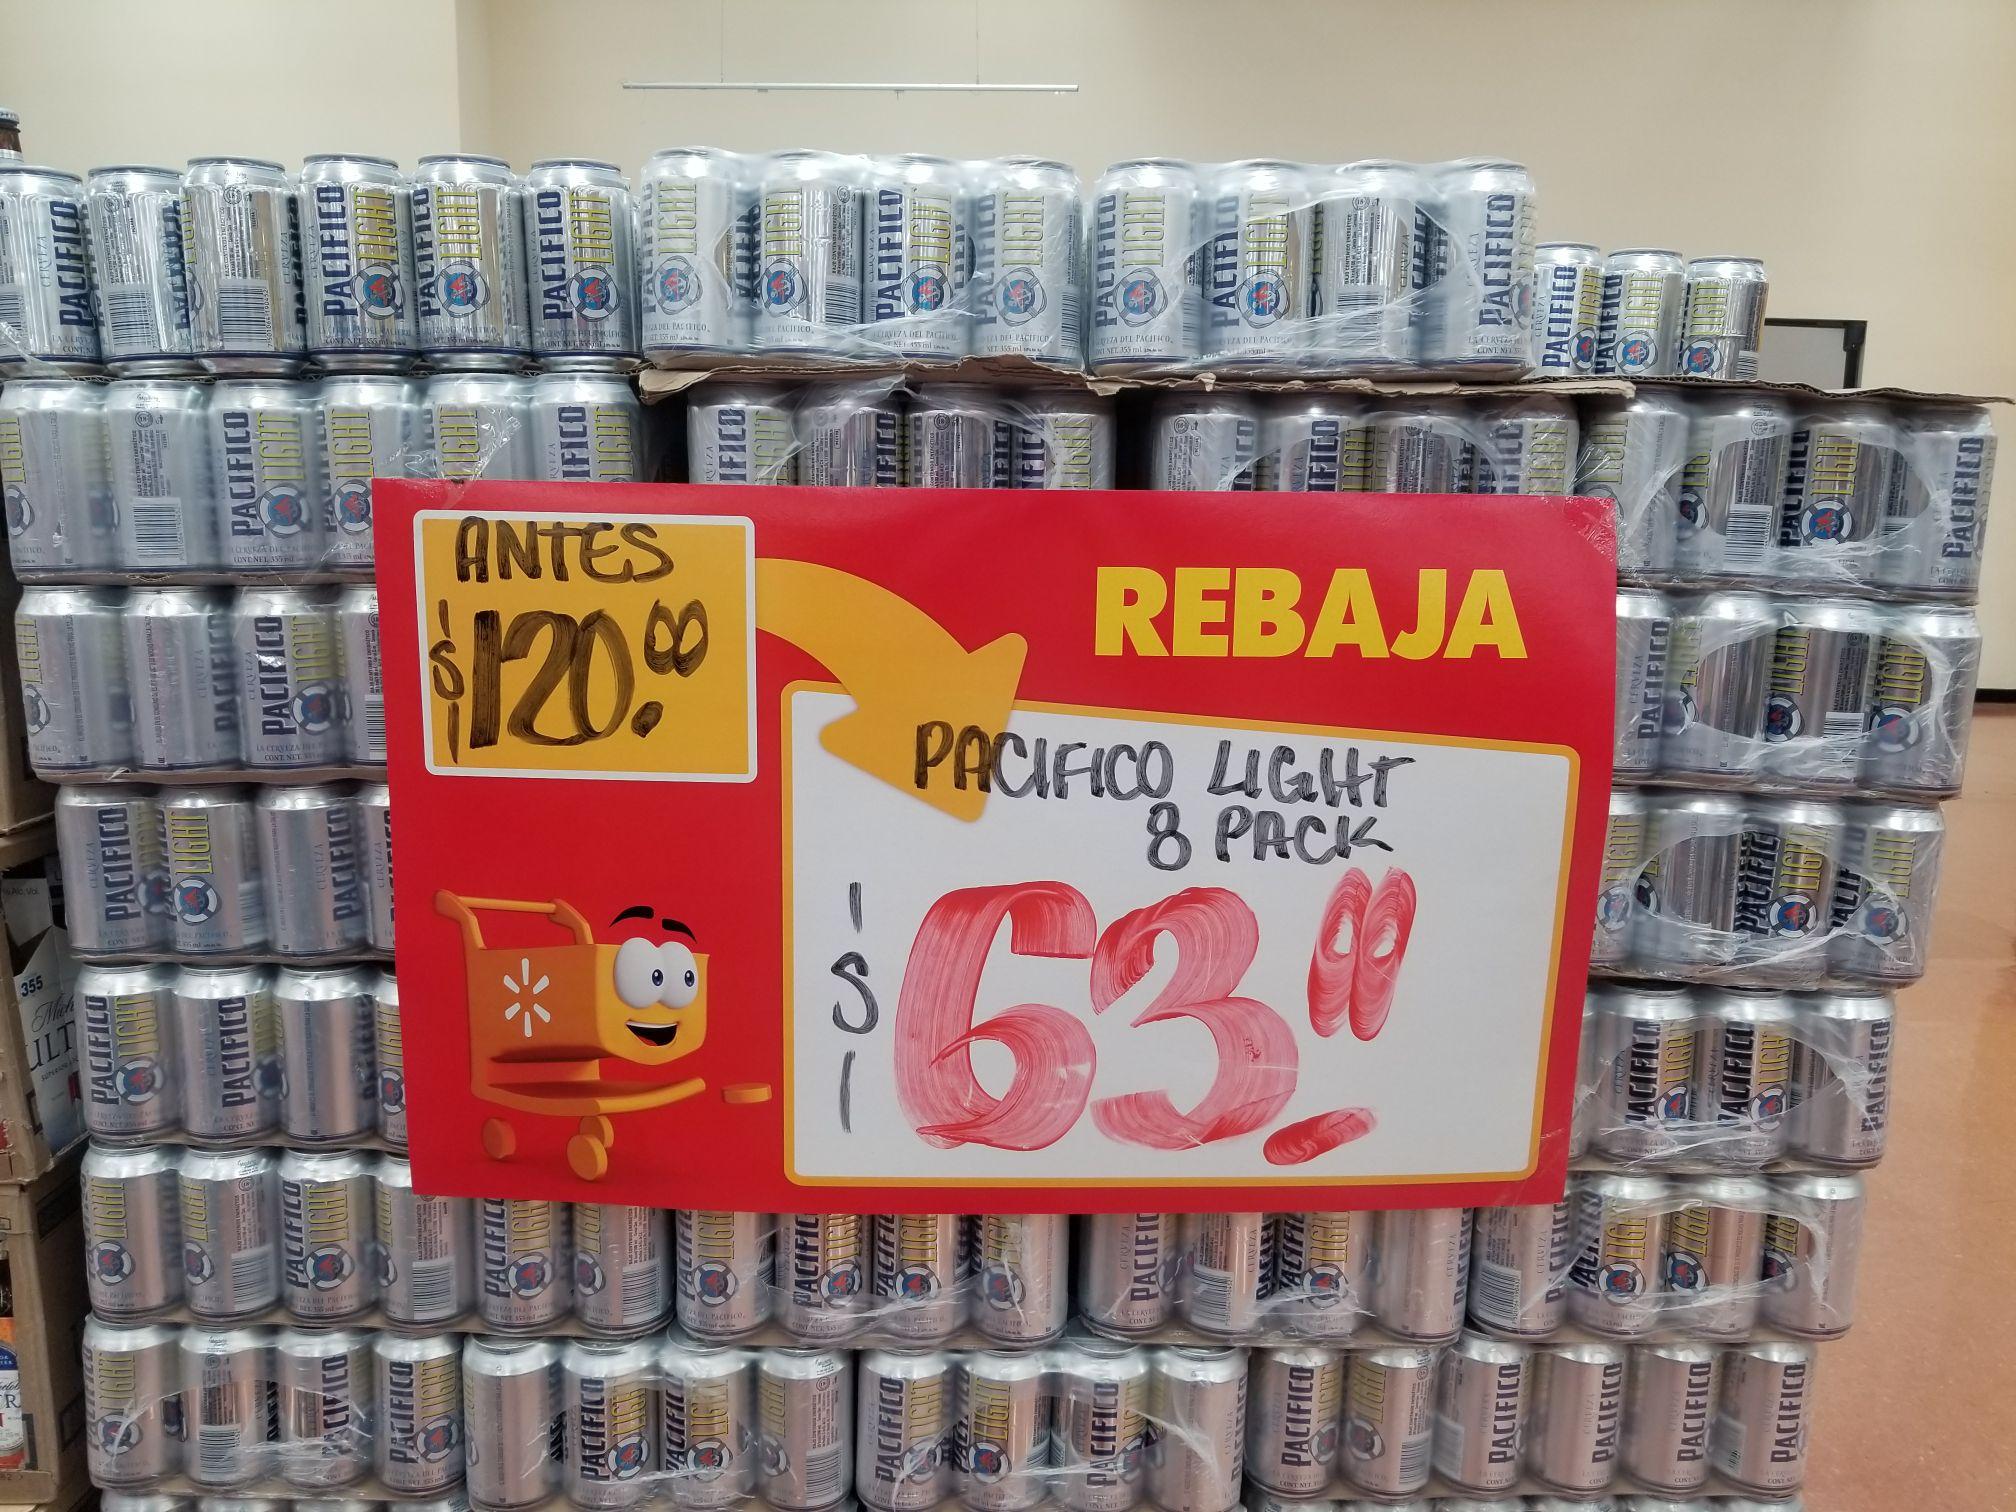 Walmart Ejército Mexicano 8 Pack Pacifico Light a $63